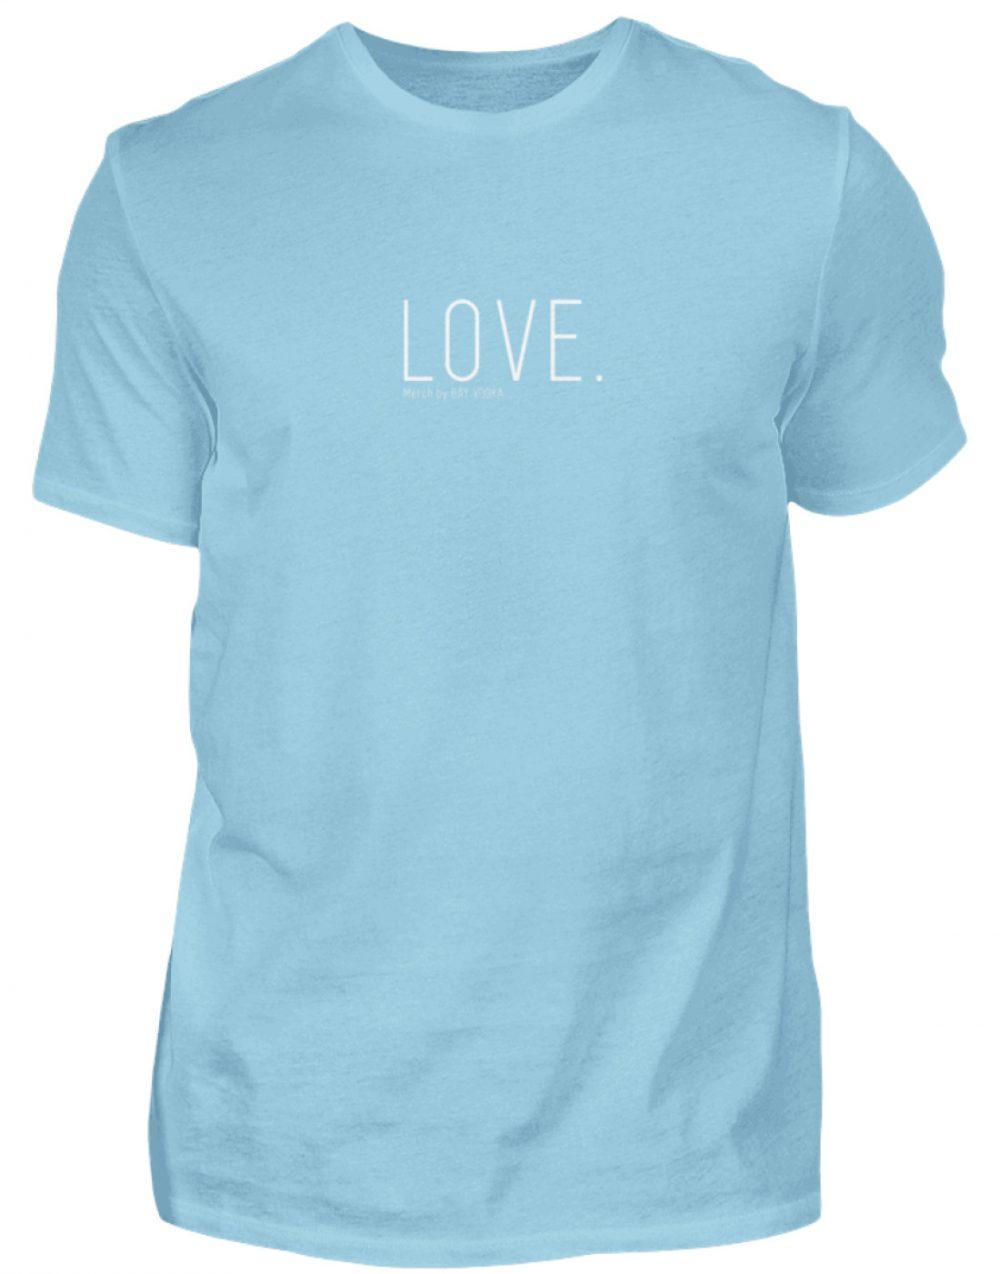 LOVE. - Herren Premiumshirt-674